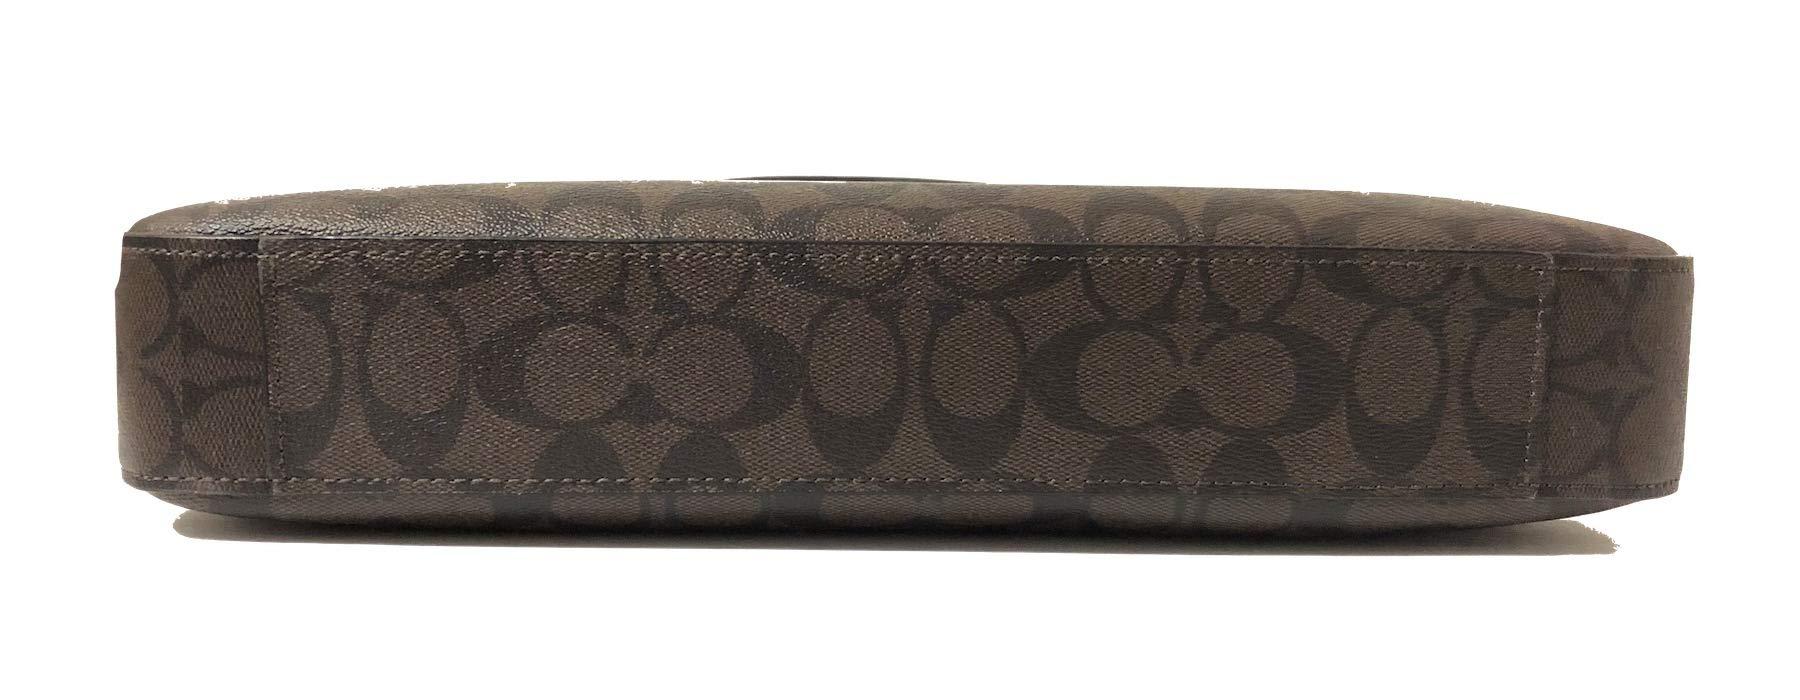 COACH Signature Laptop Bag F39023 Brown/Black by Coach (Image #4)